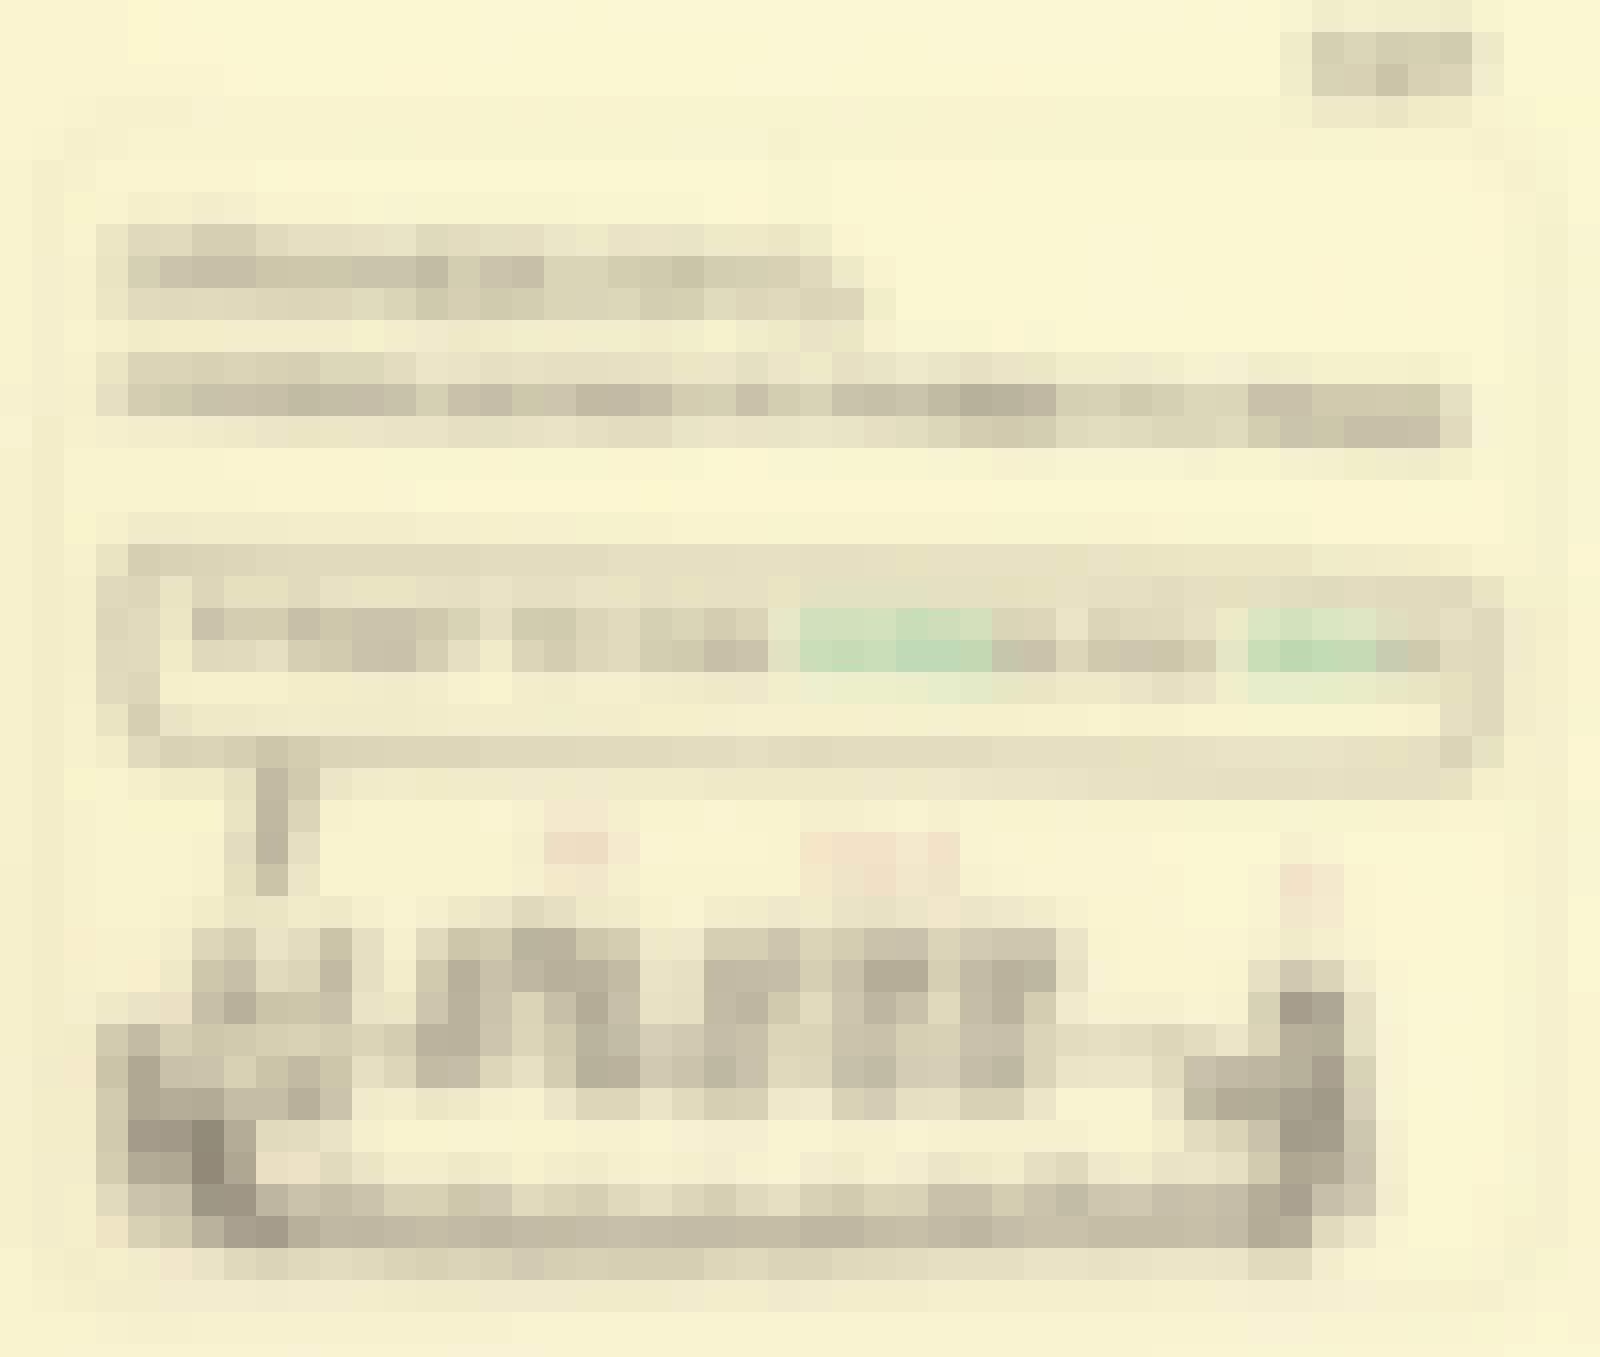 Spoonerisms - Sketchplanations